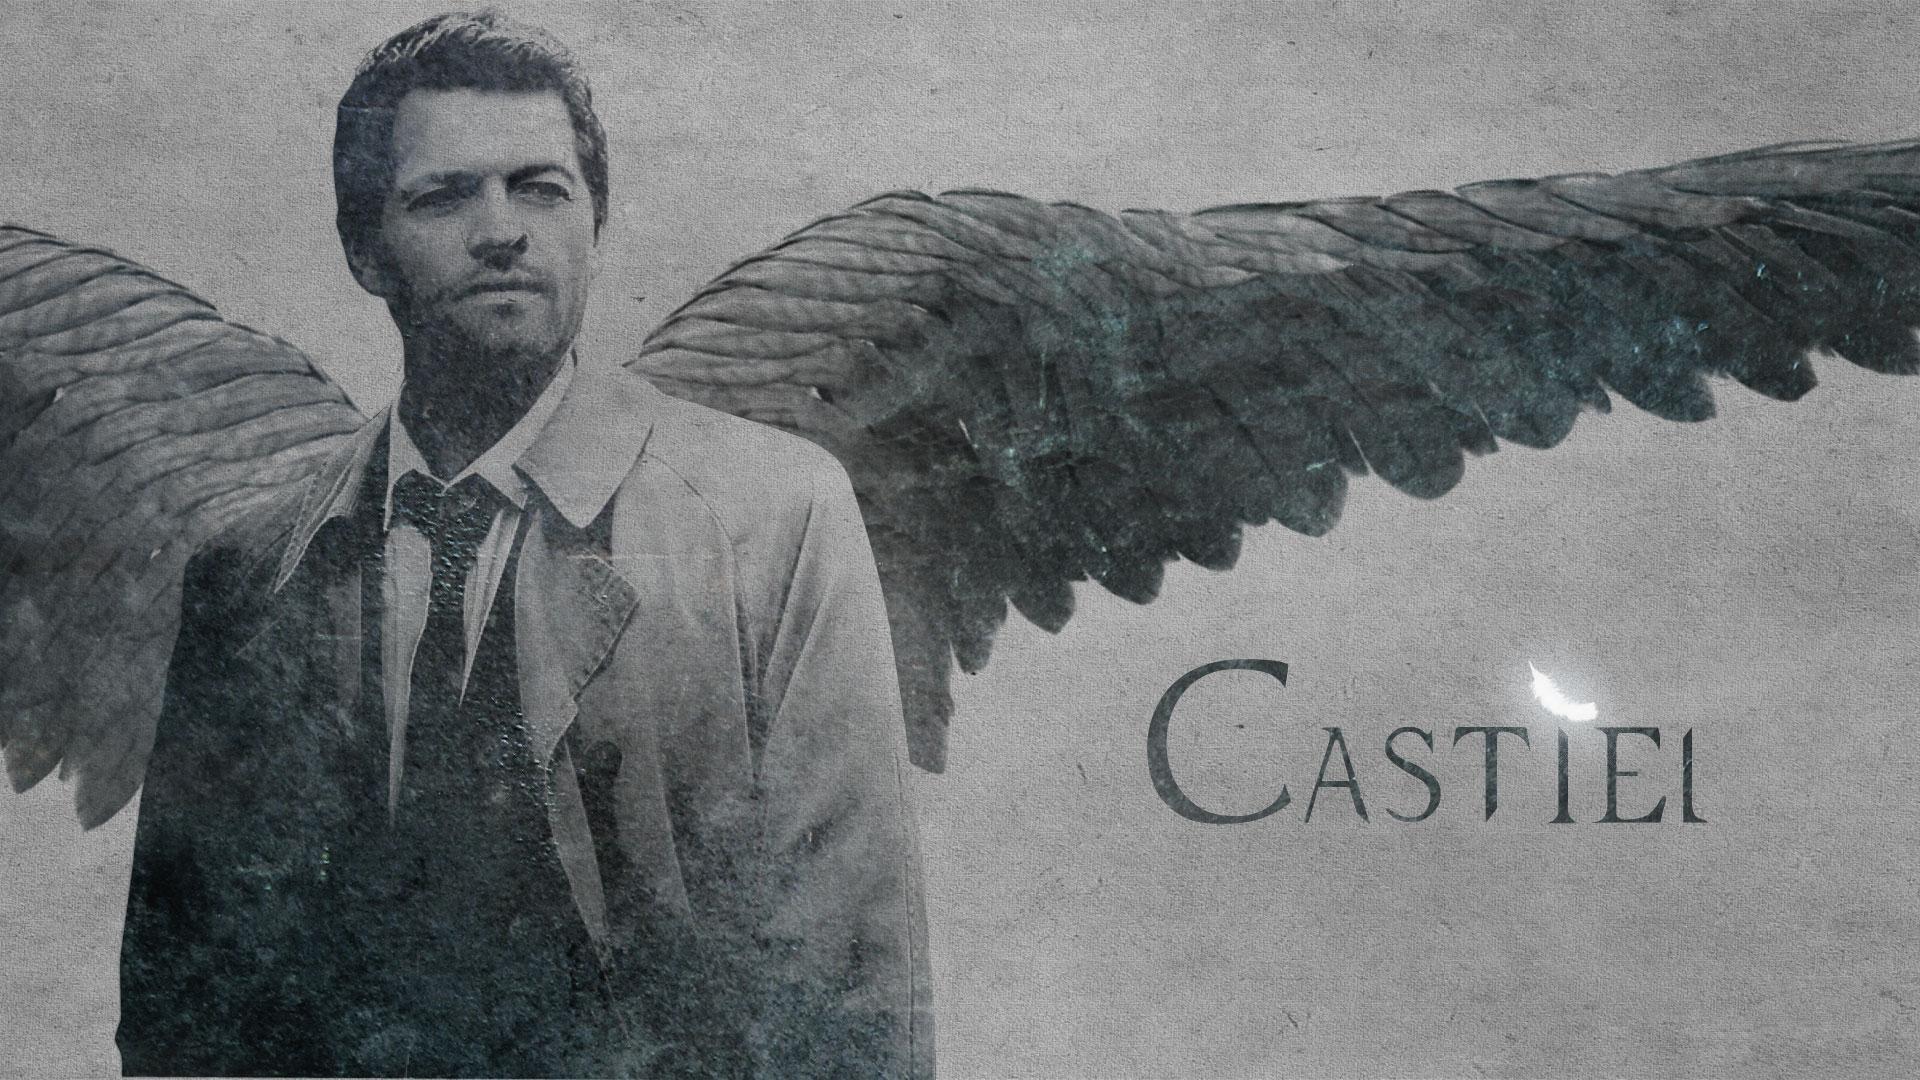 Castiel-Supernatural-Iphone-Image-Download-Free